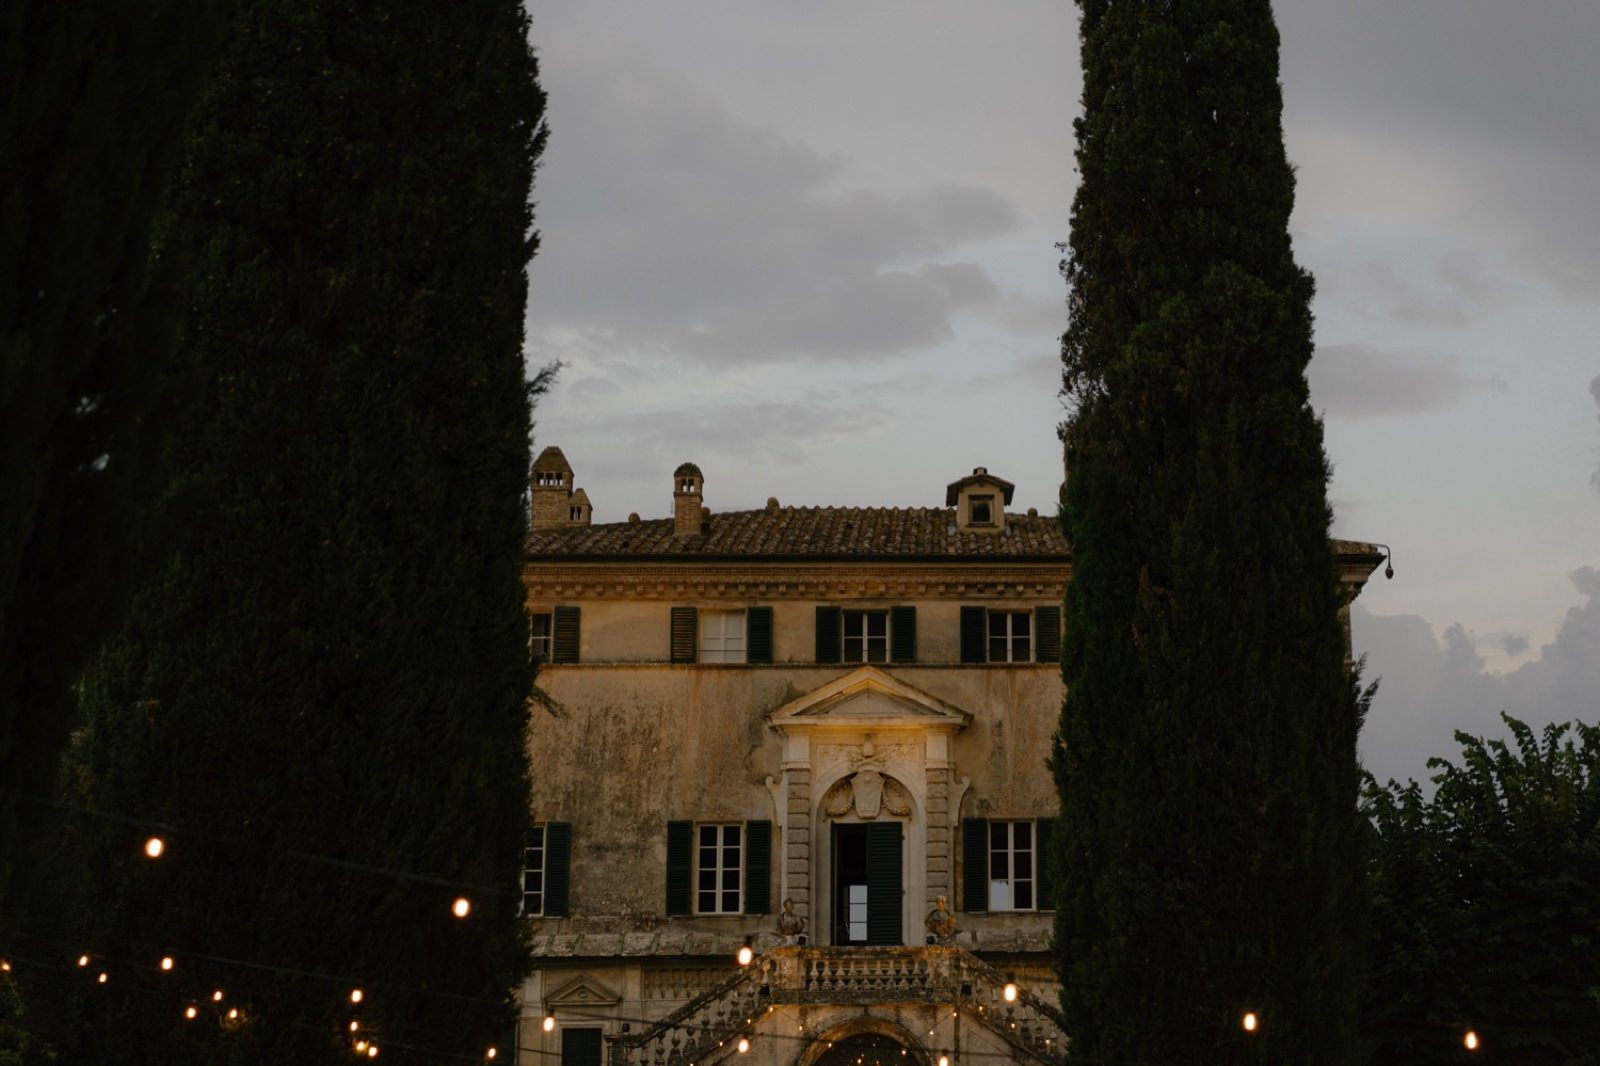 Villa Cetinale at sunset